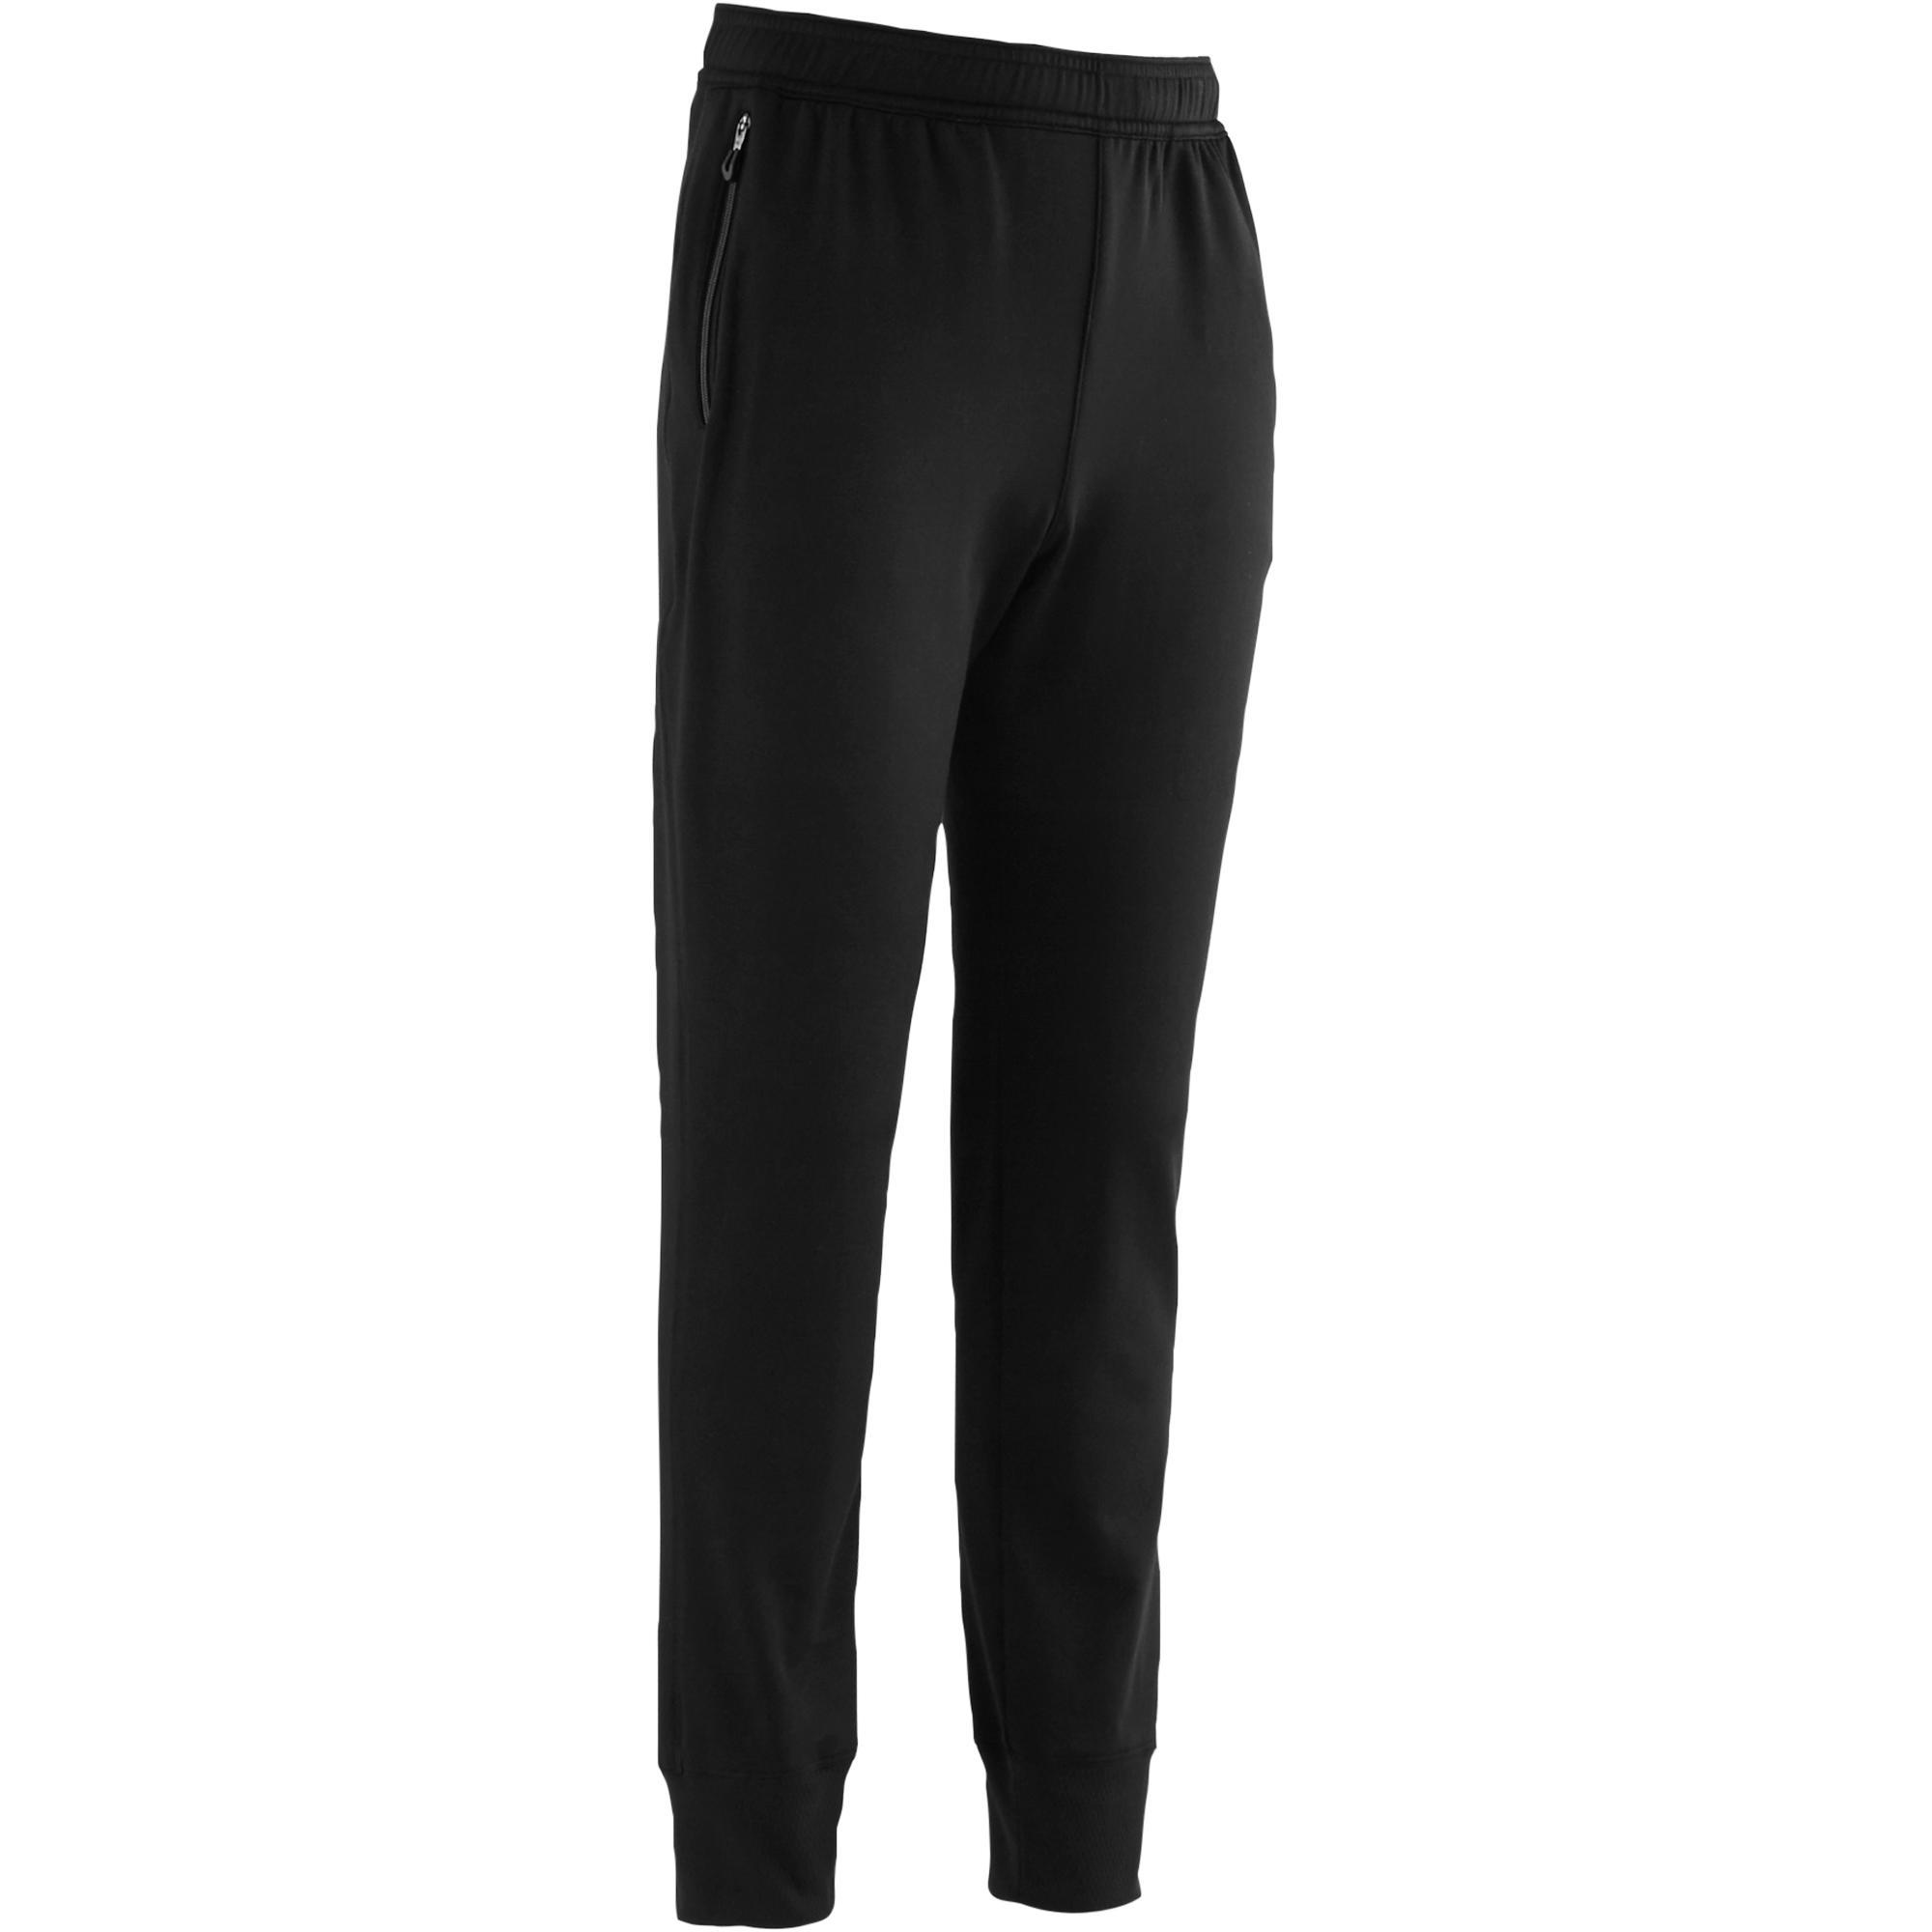 Pantalón cálido sintético transpirable S500 niño GIMNASIA JÚNIOR negro